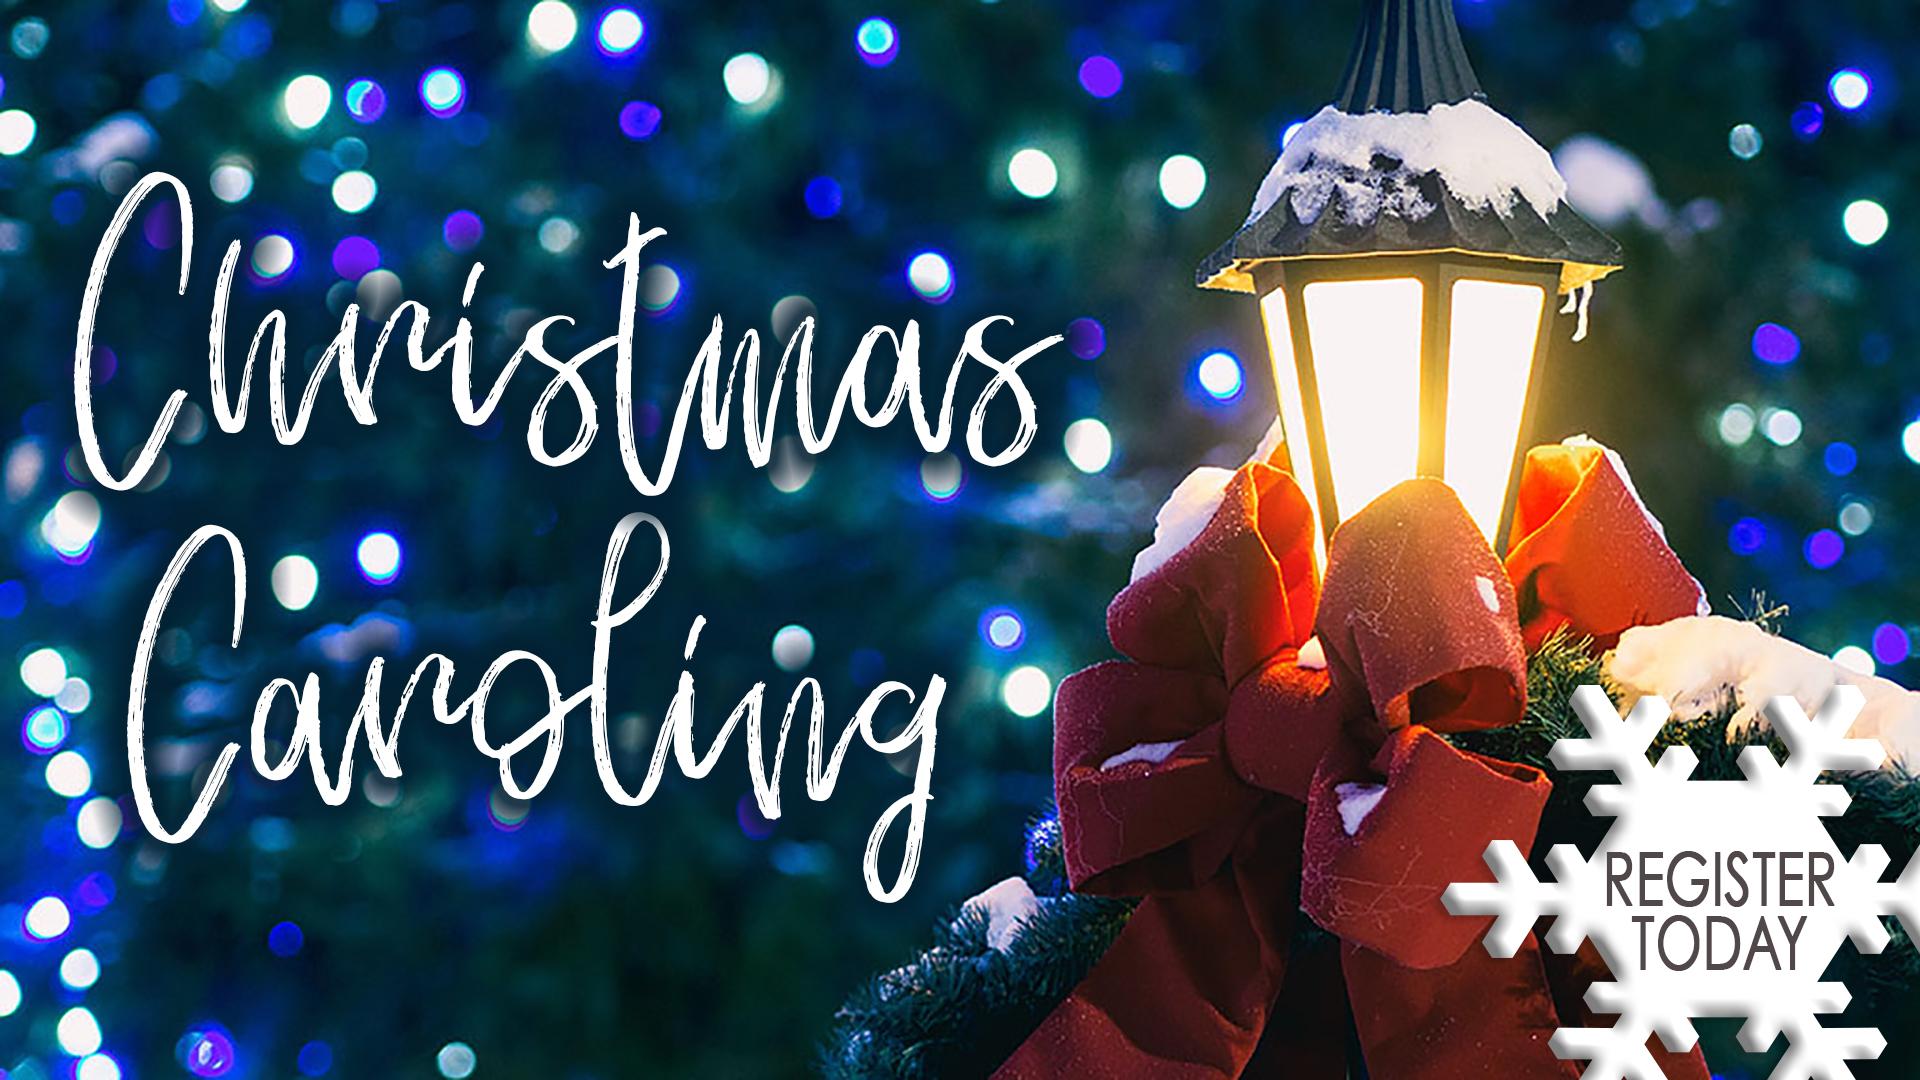 Christmas Caroling Images.Integrity Church Christmas Caroling Integrity Church